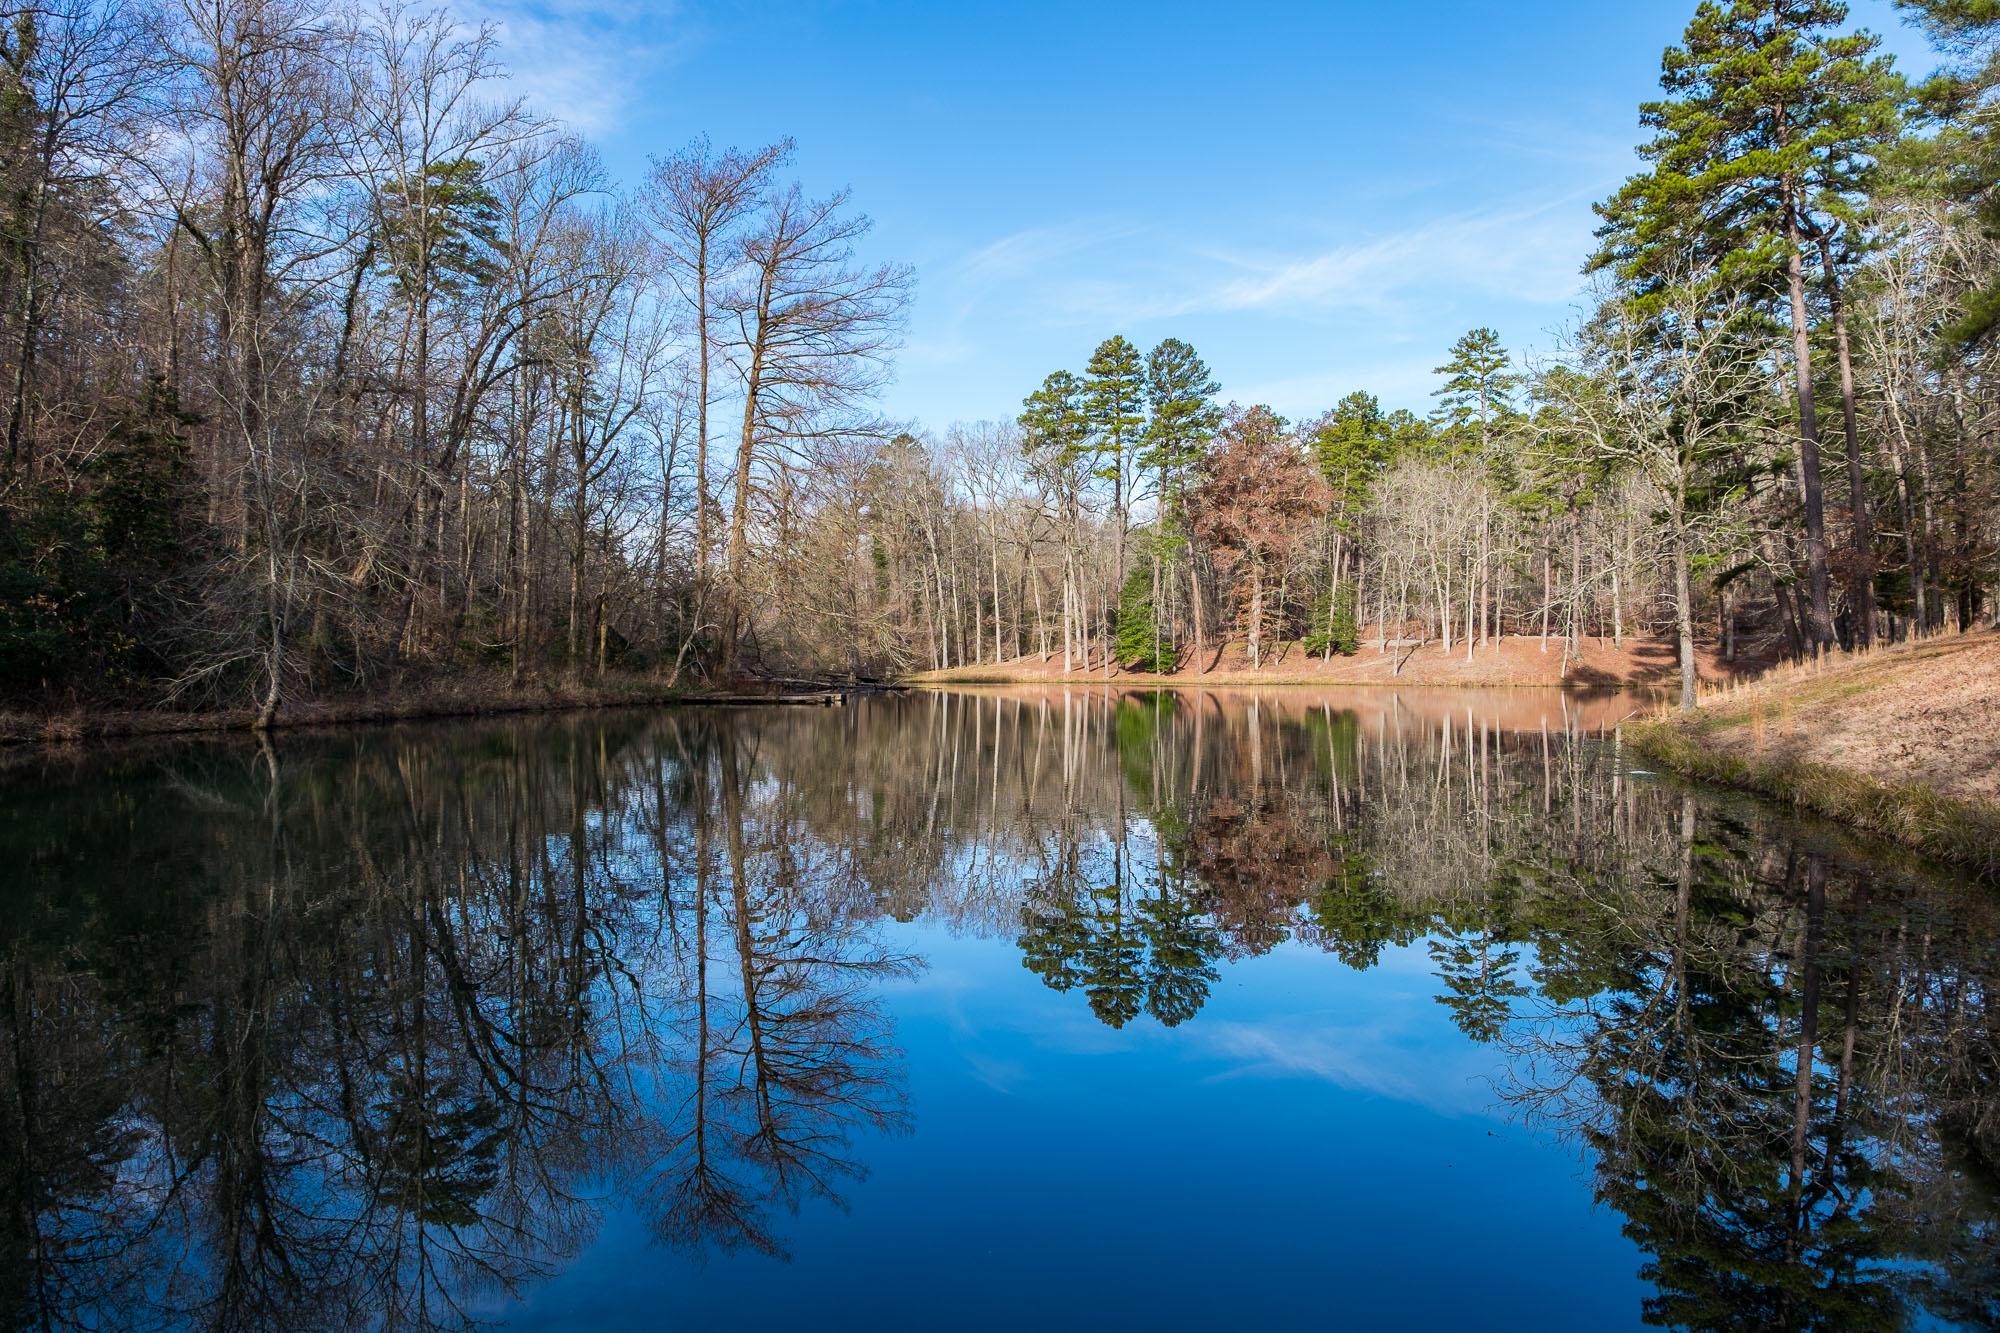 Pretty lake reflections along the trail.